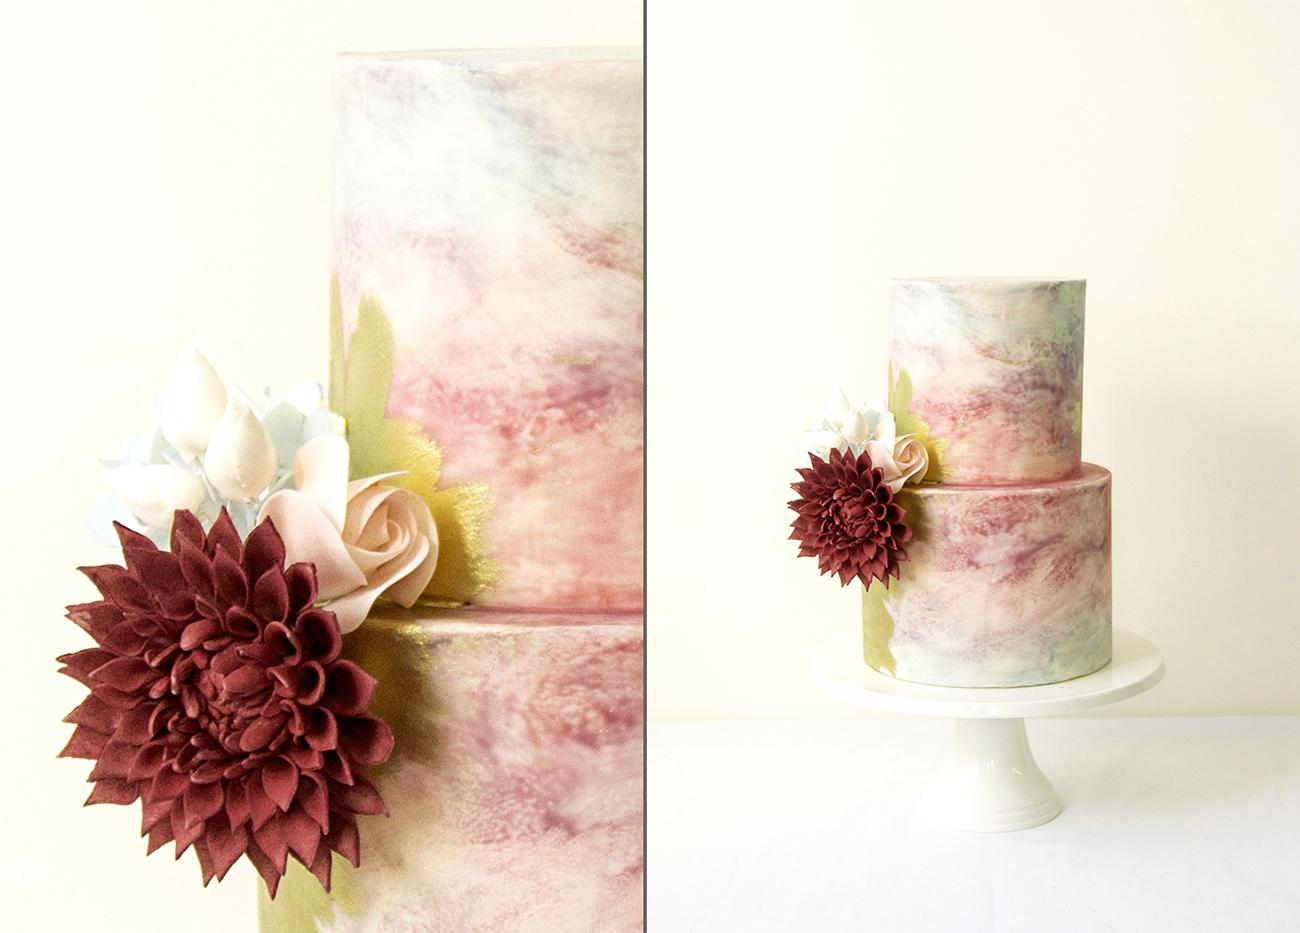 Pia | The Abigail Bloom Cake Company